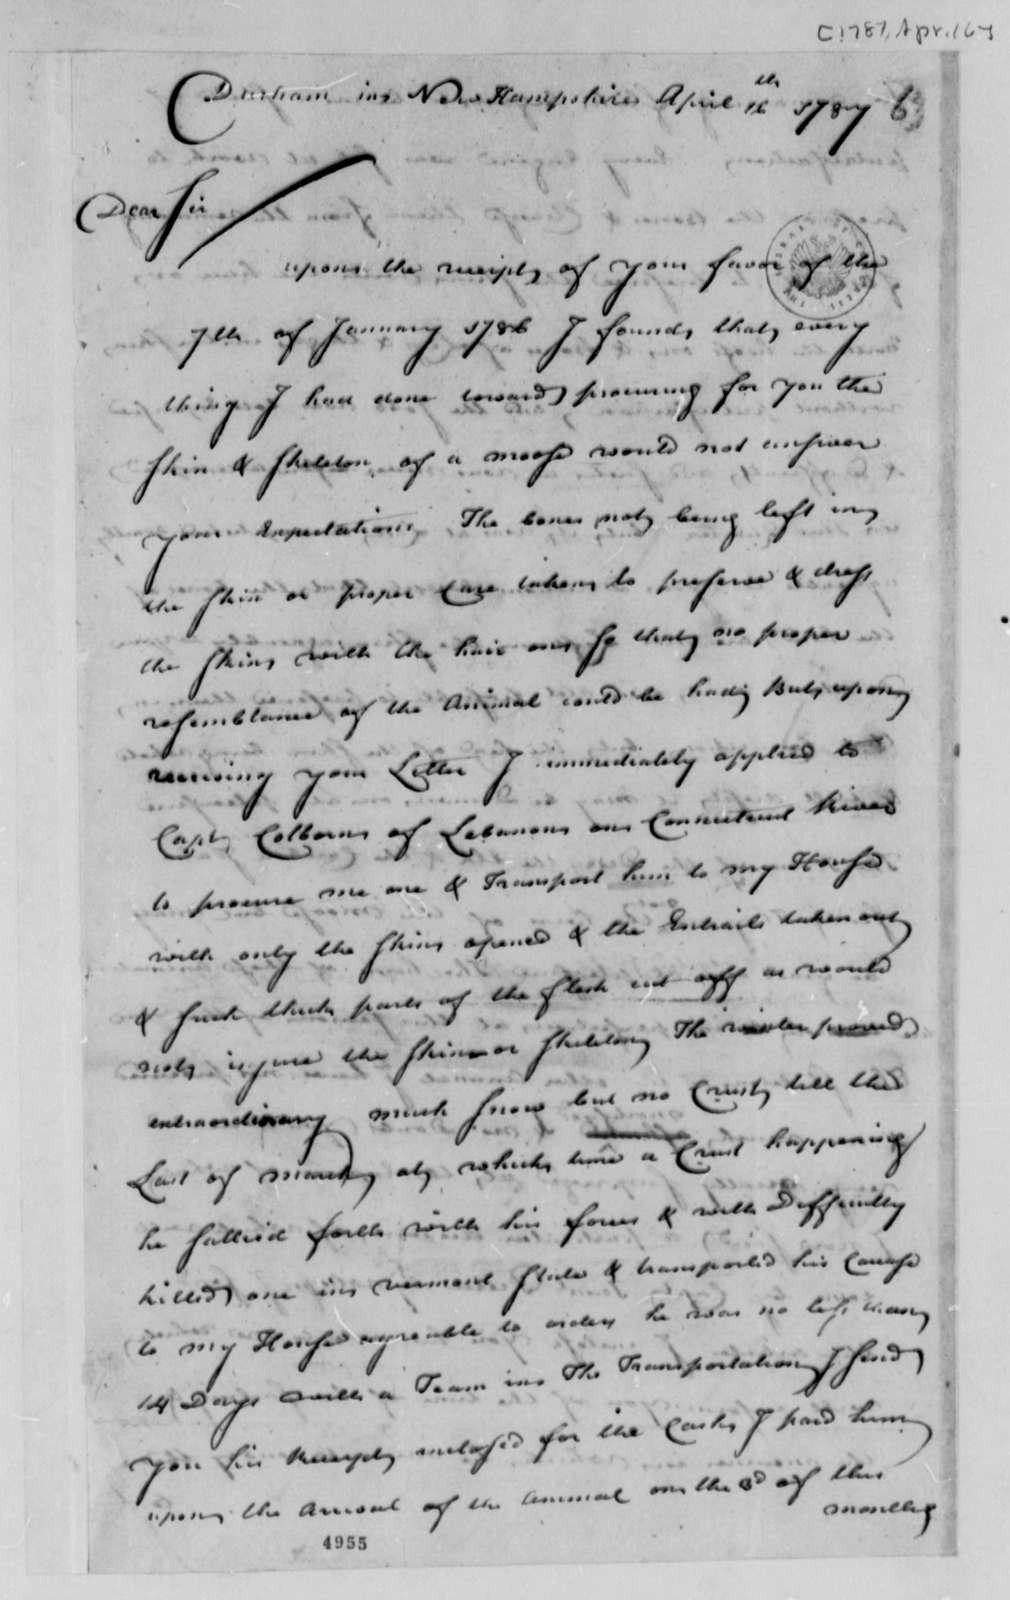 John Sullivan to Thomas Jefferson, April 16, 1787